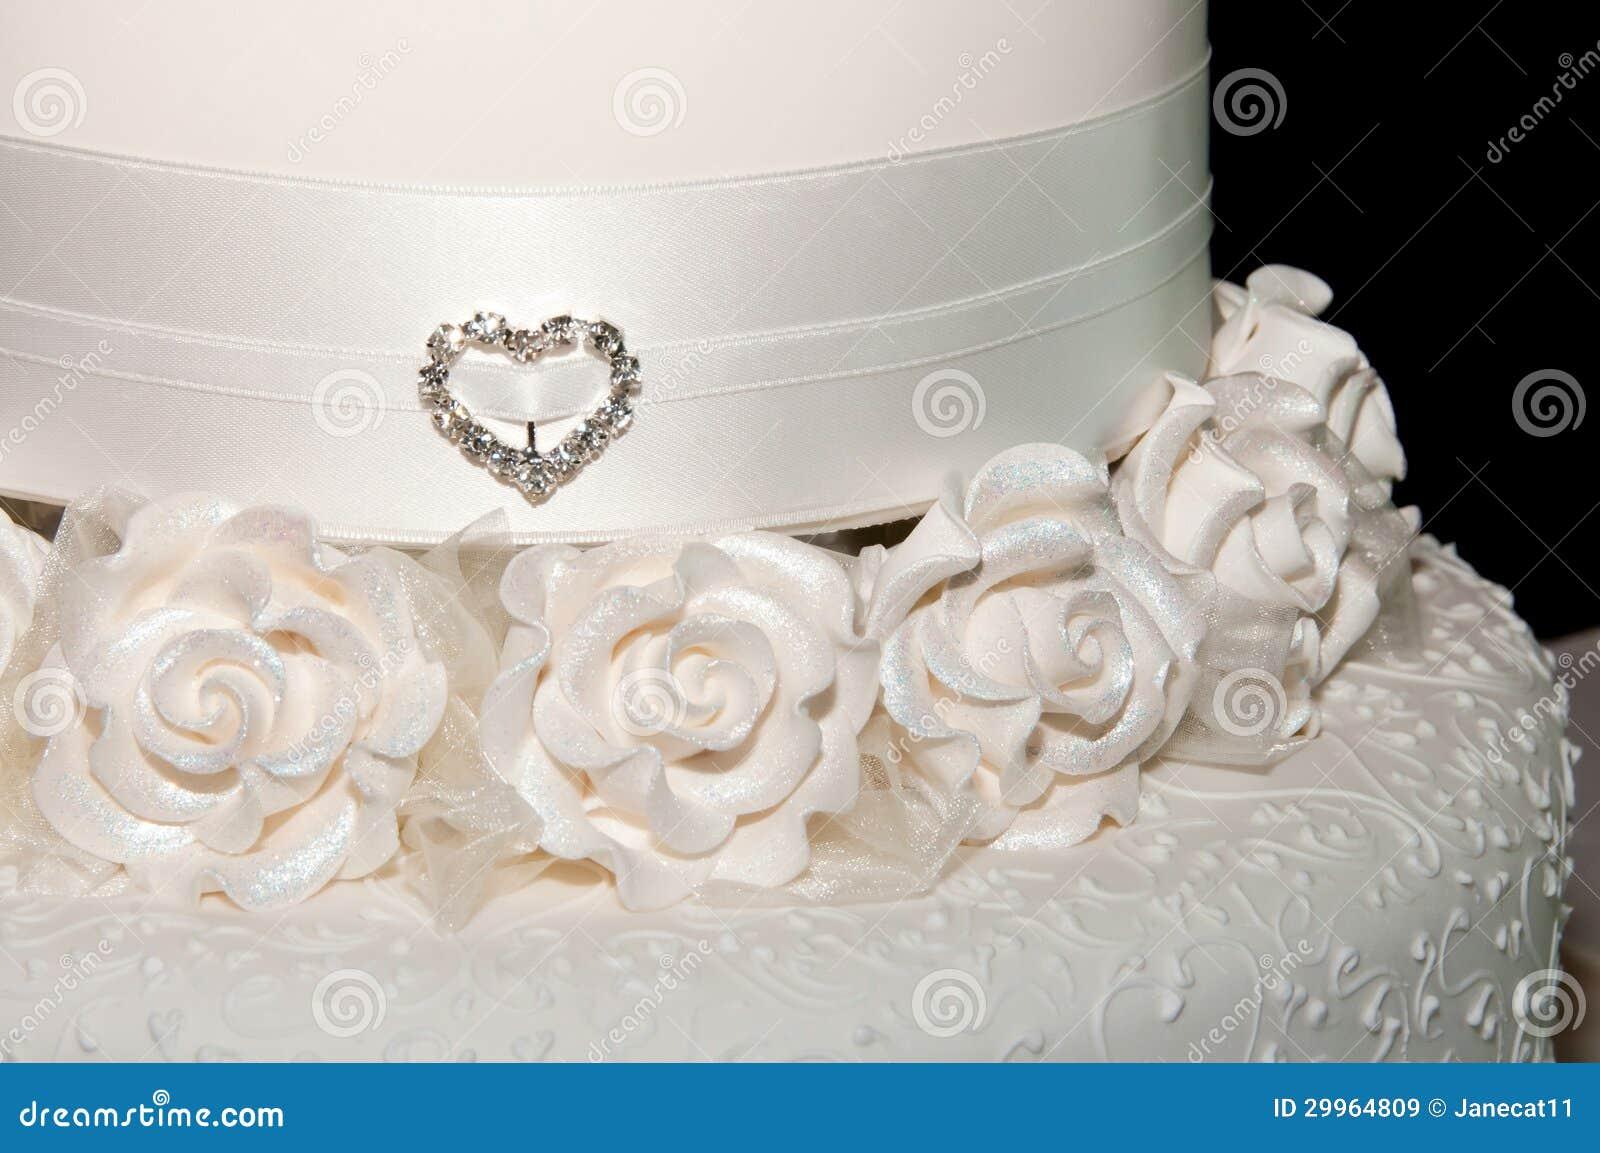 Kate And William Cutting Wedding Cake